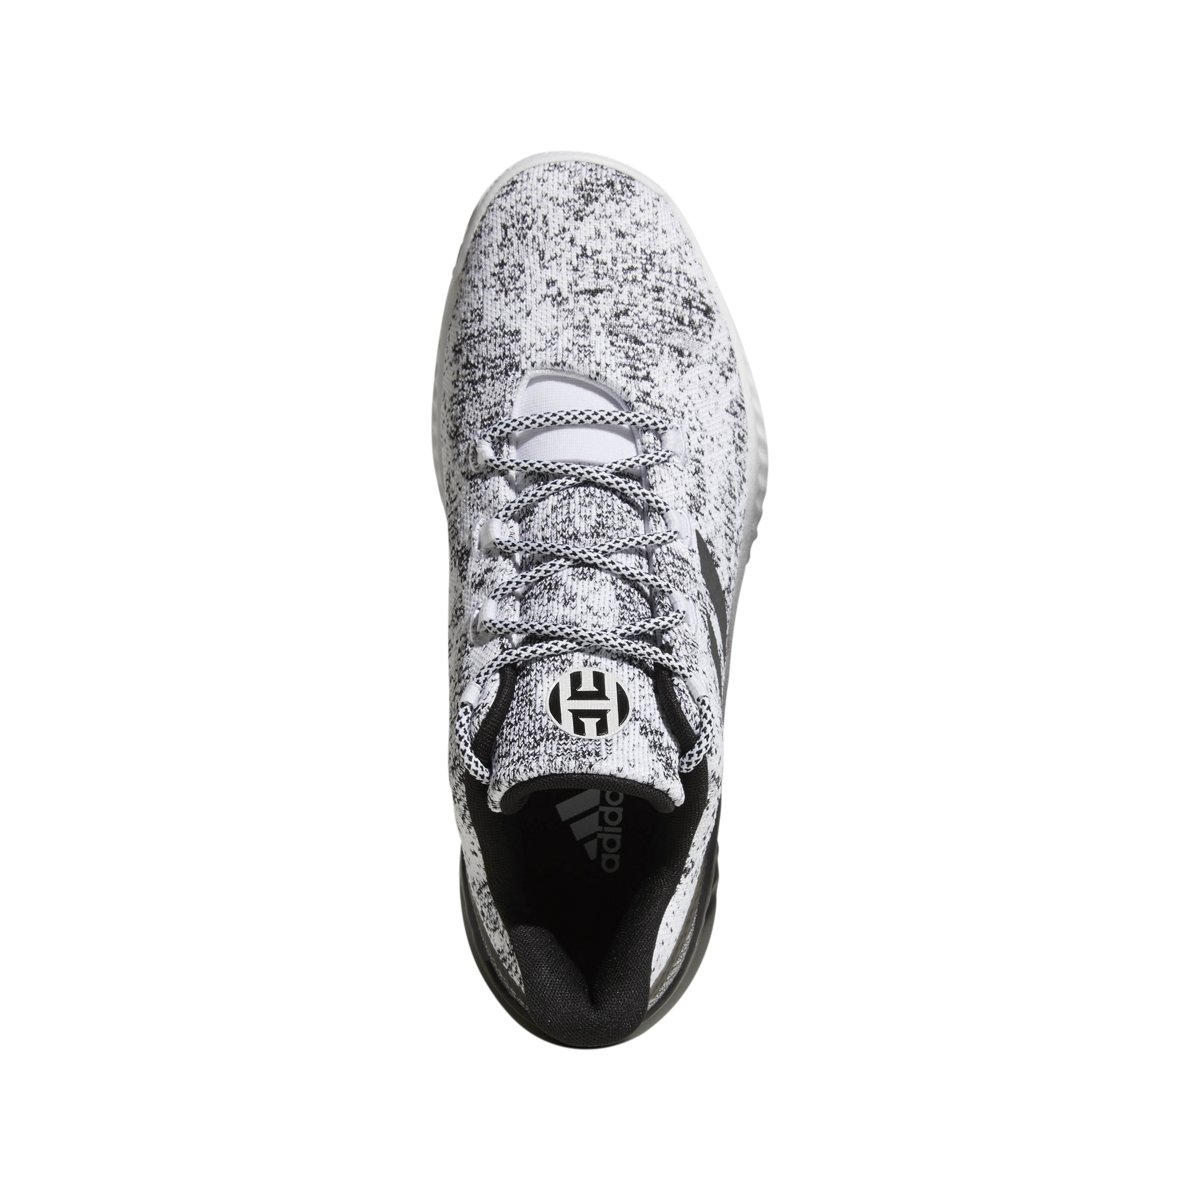 adidas B/E X Shoe Basketball Homme Blanc/Noir